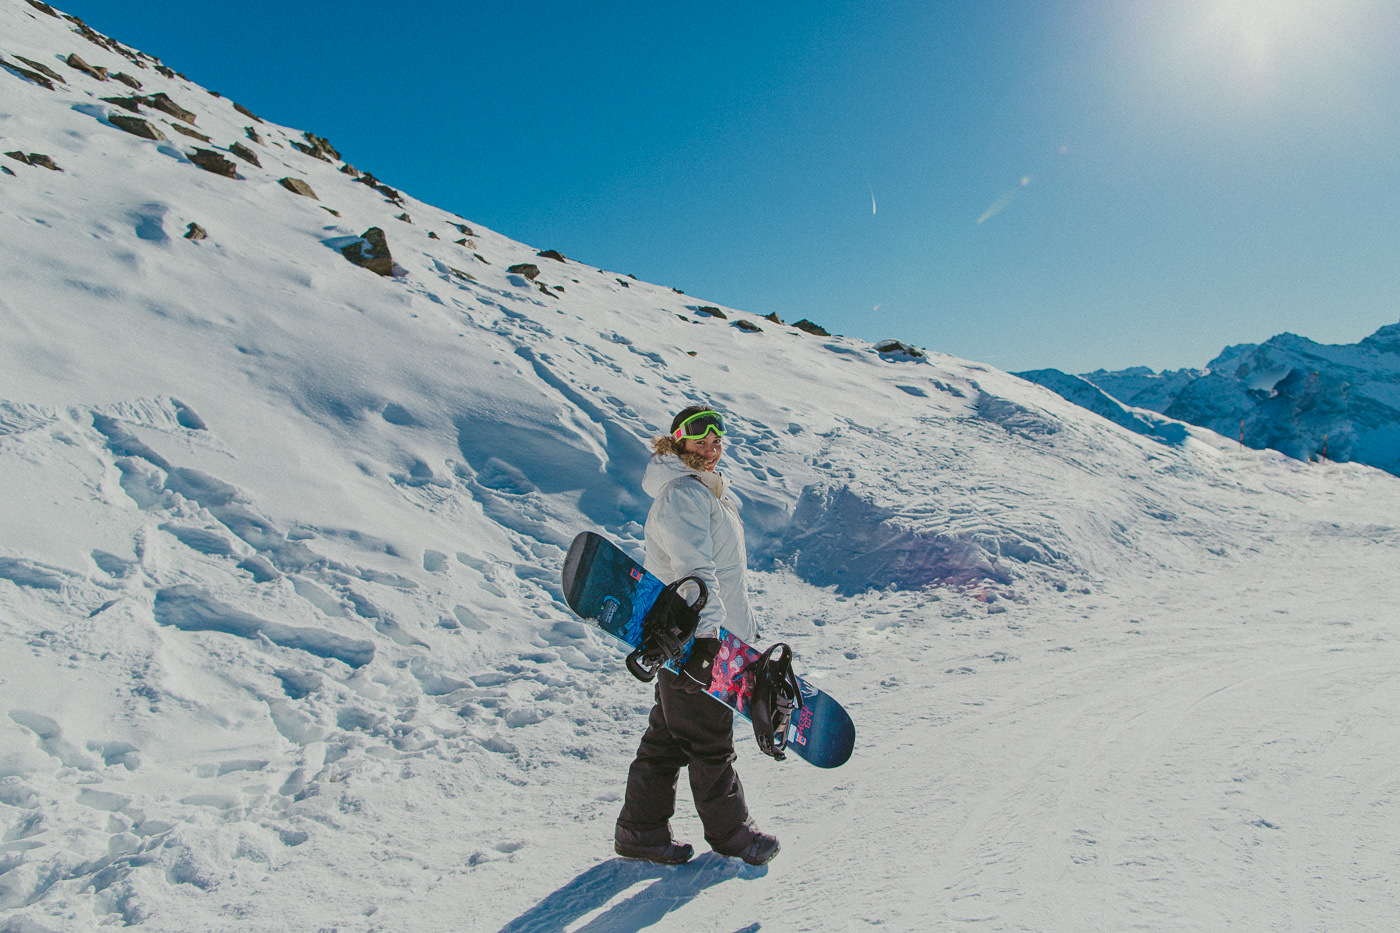 snowboarding start